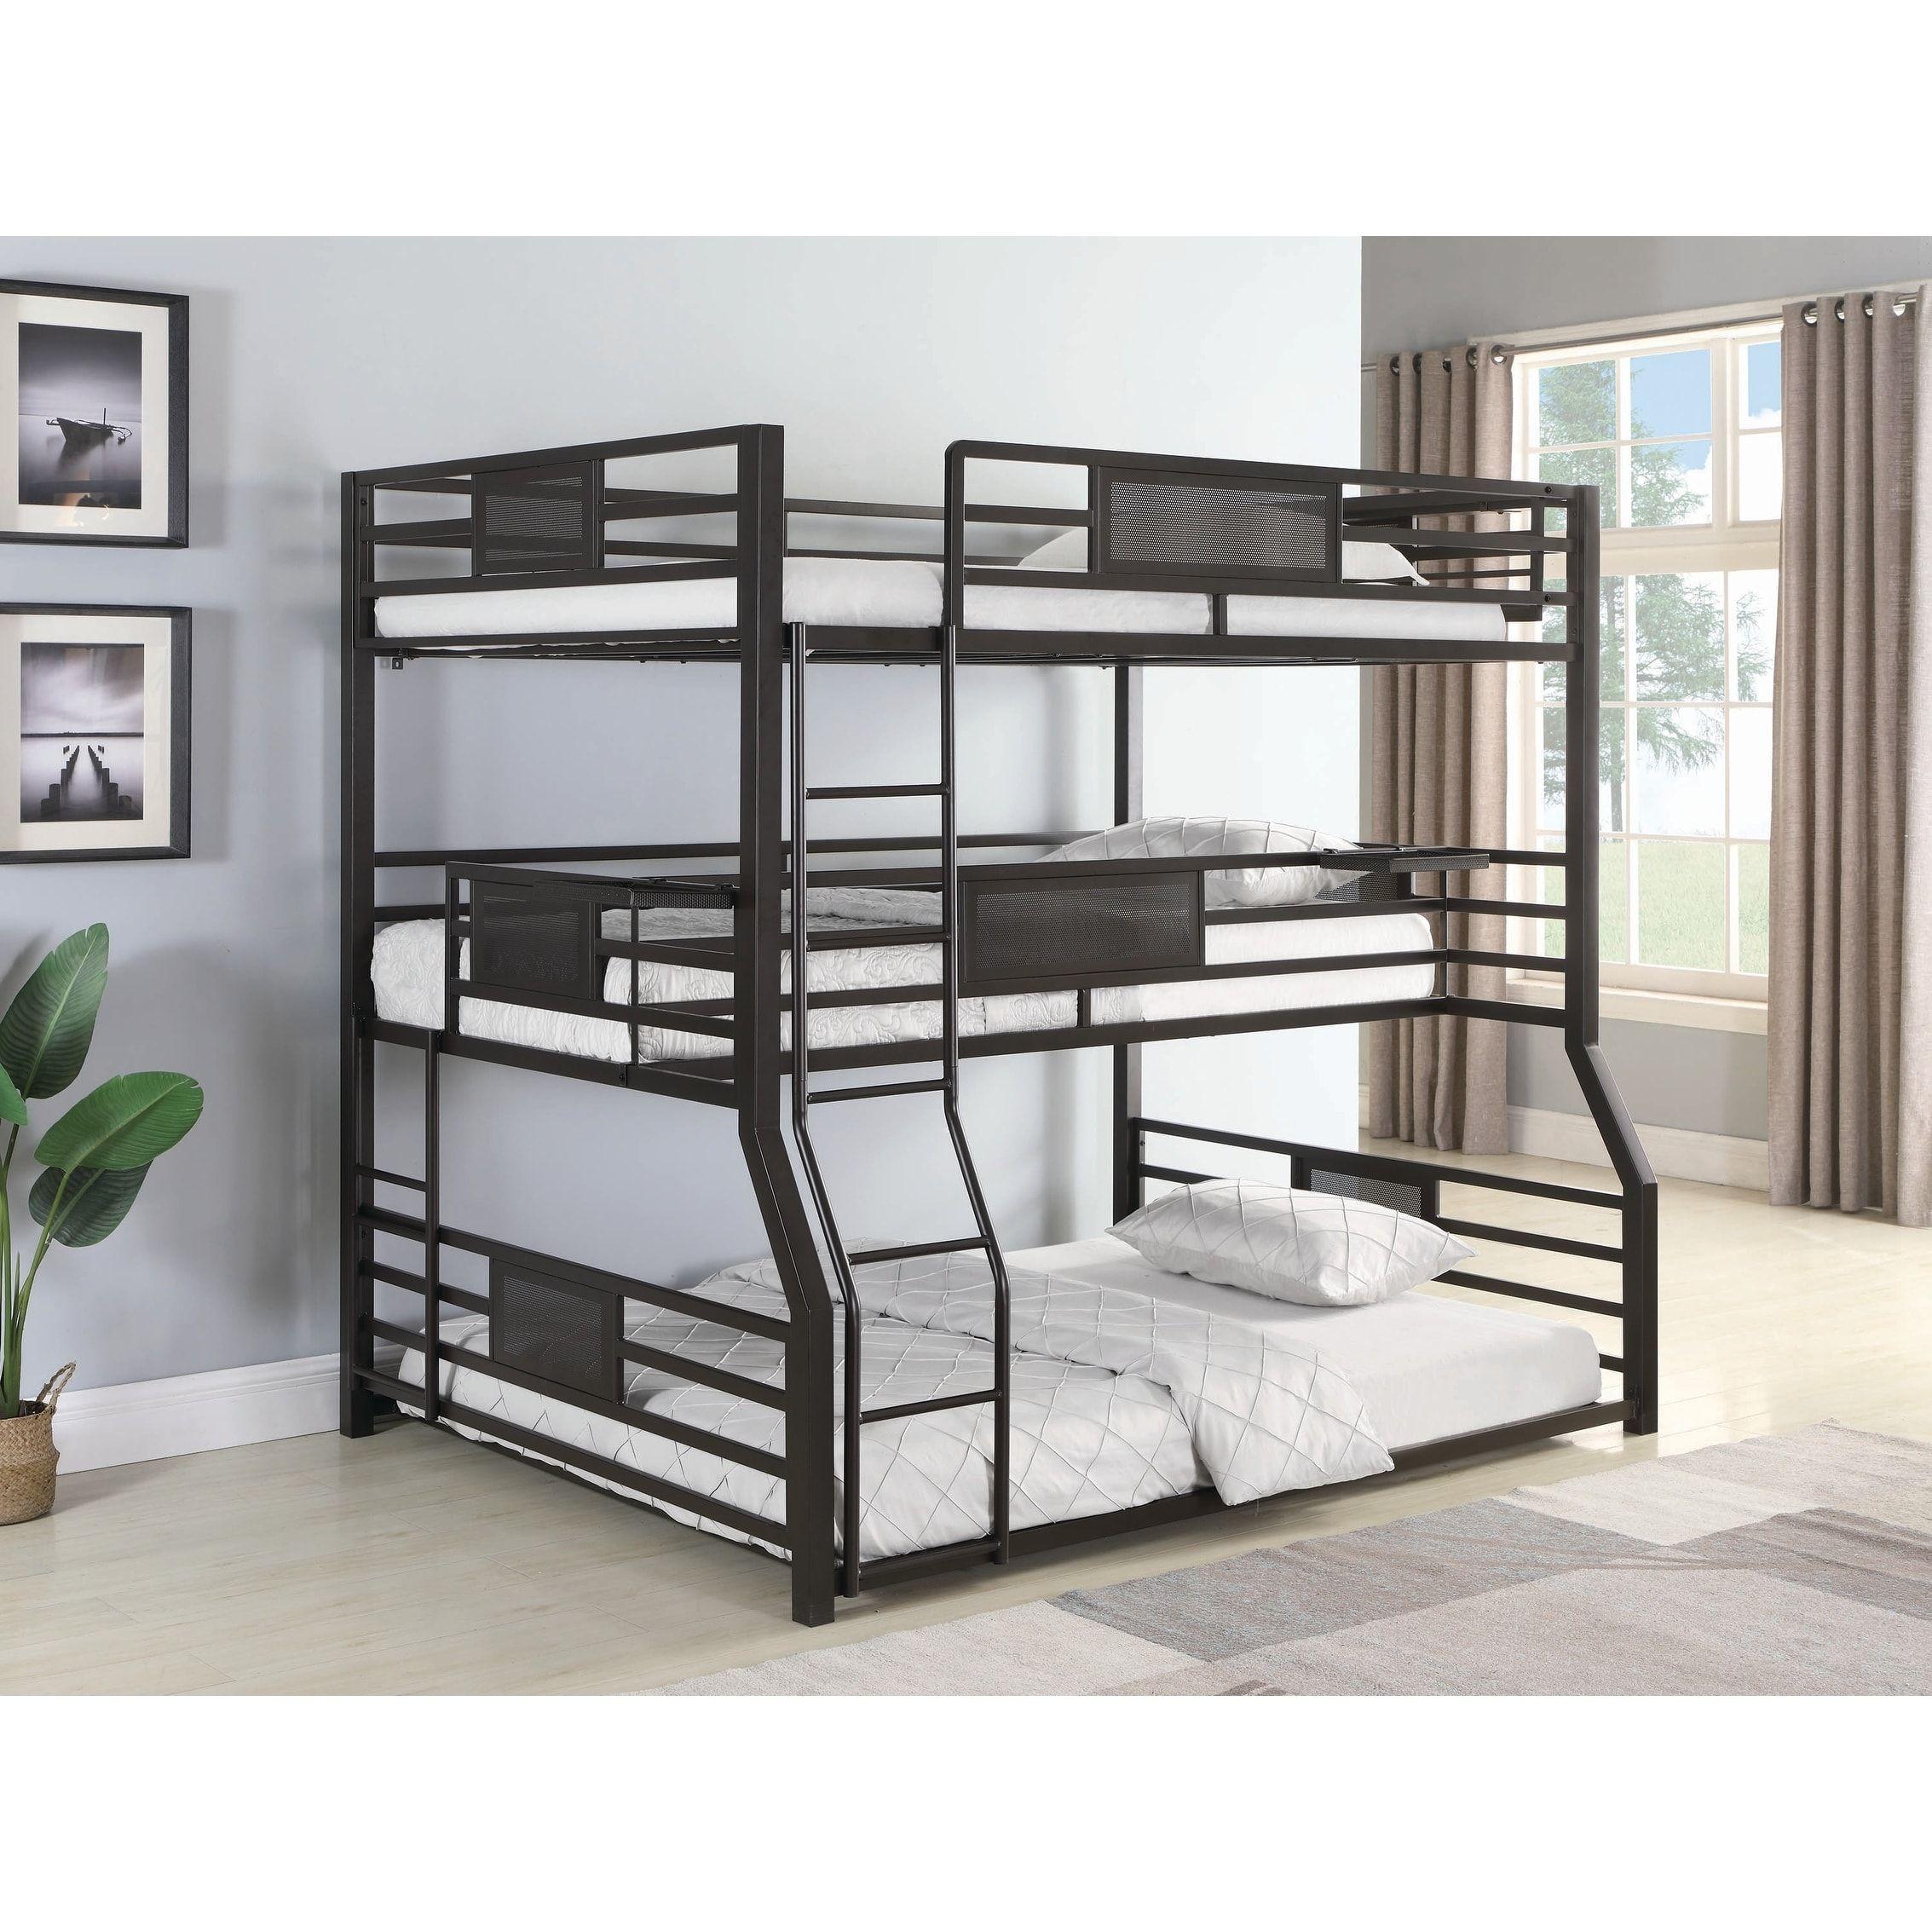 Taylor & Olive Chicot Dark Bronze Triple Bunk Bed, Kids